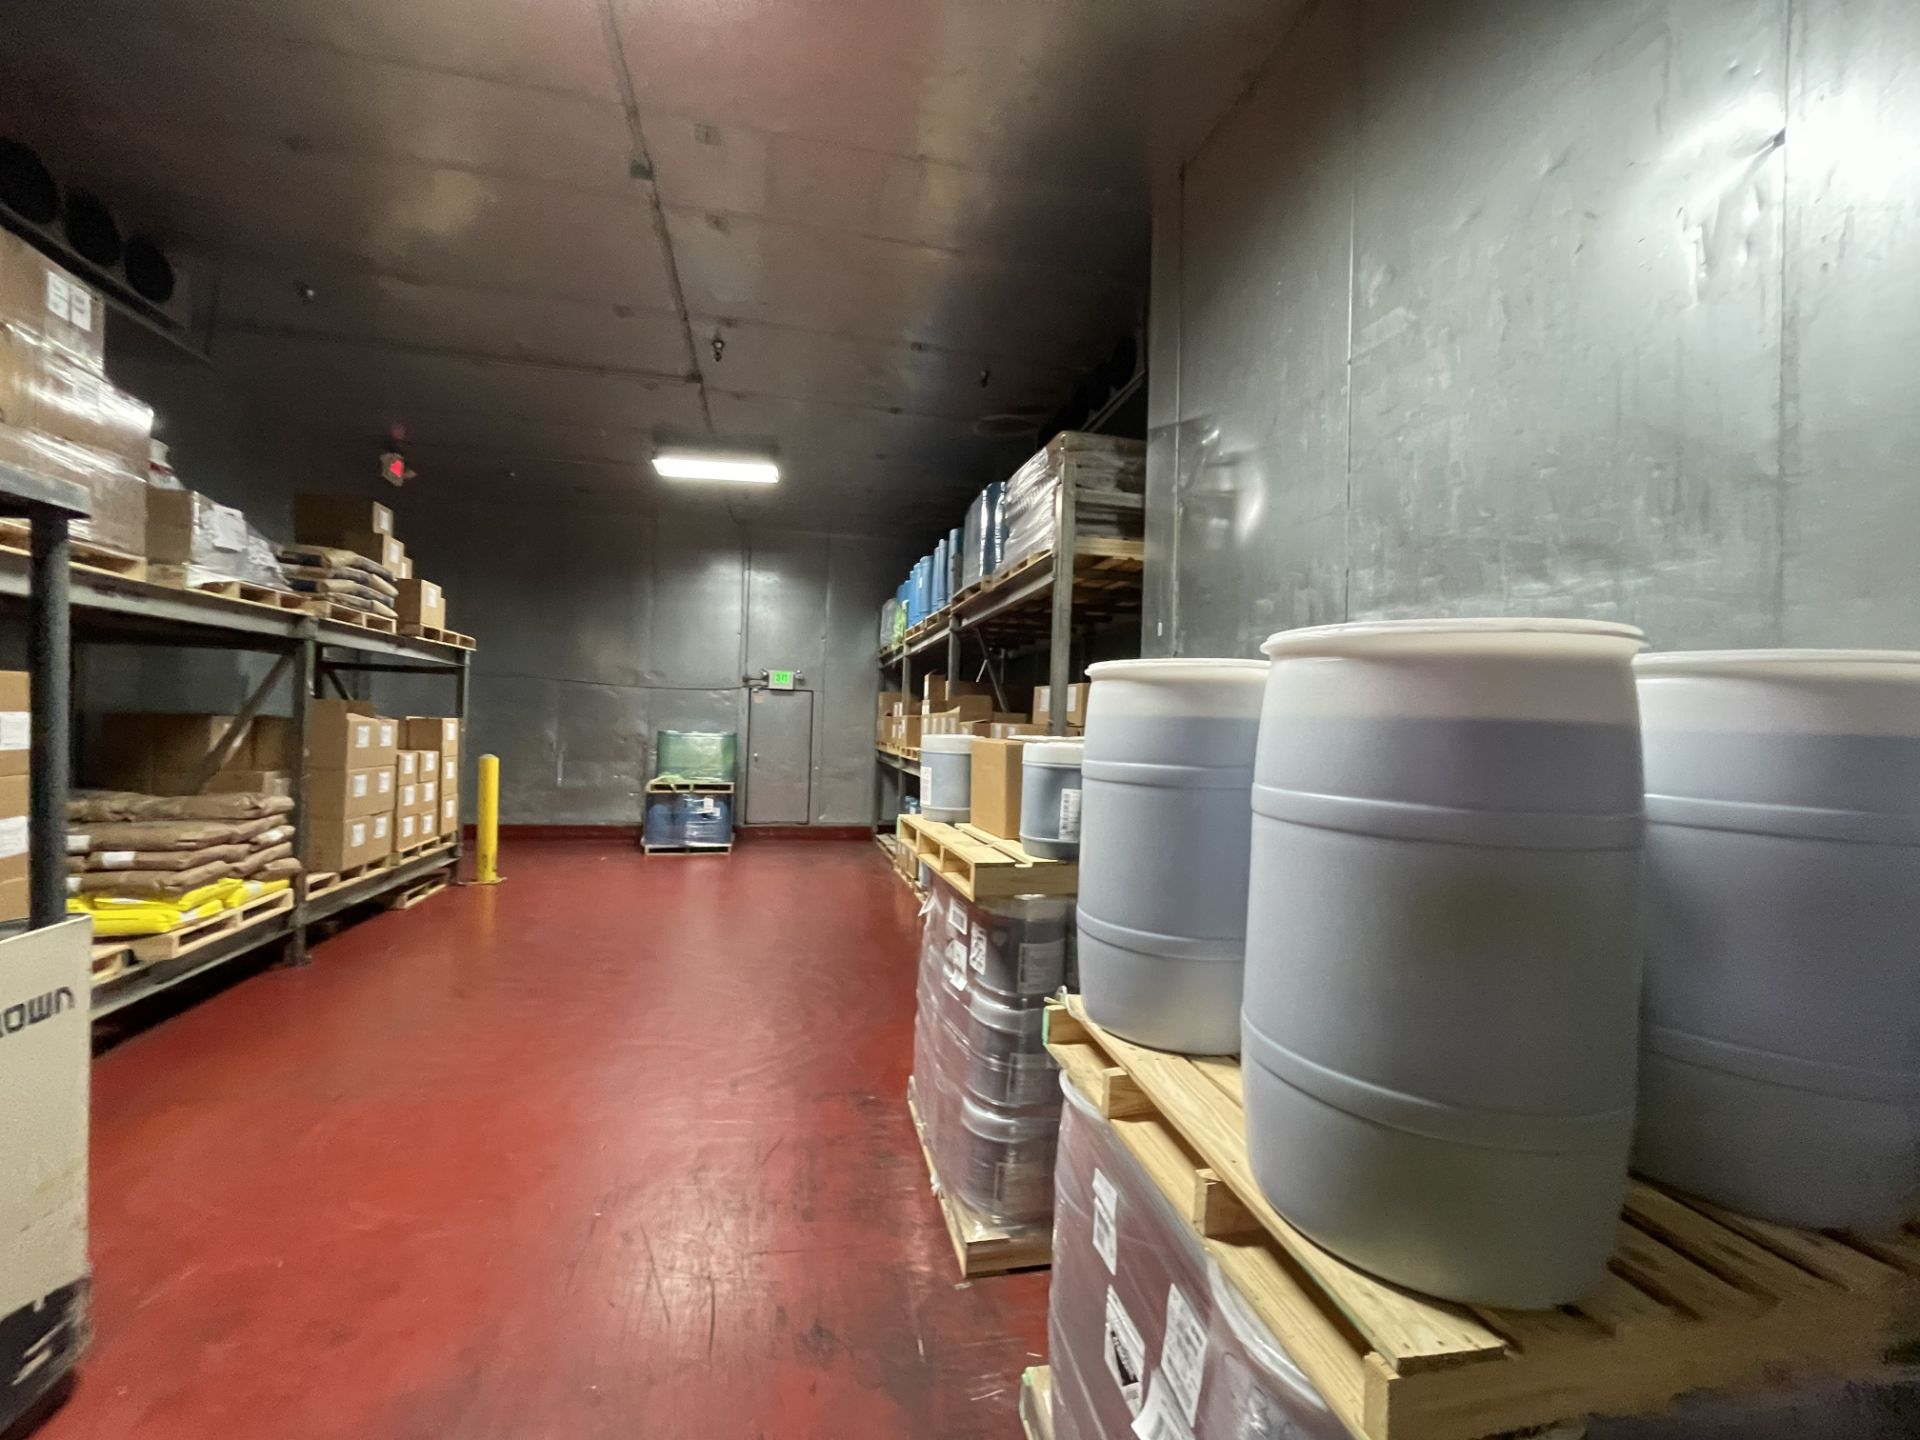 37x26 Cold Storage Room - Image 5 of 7